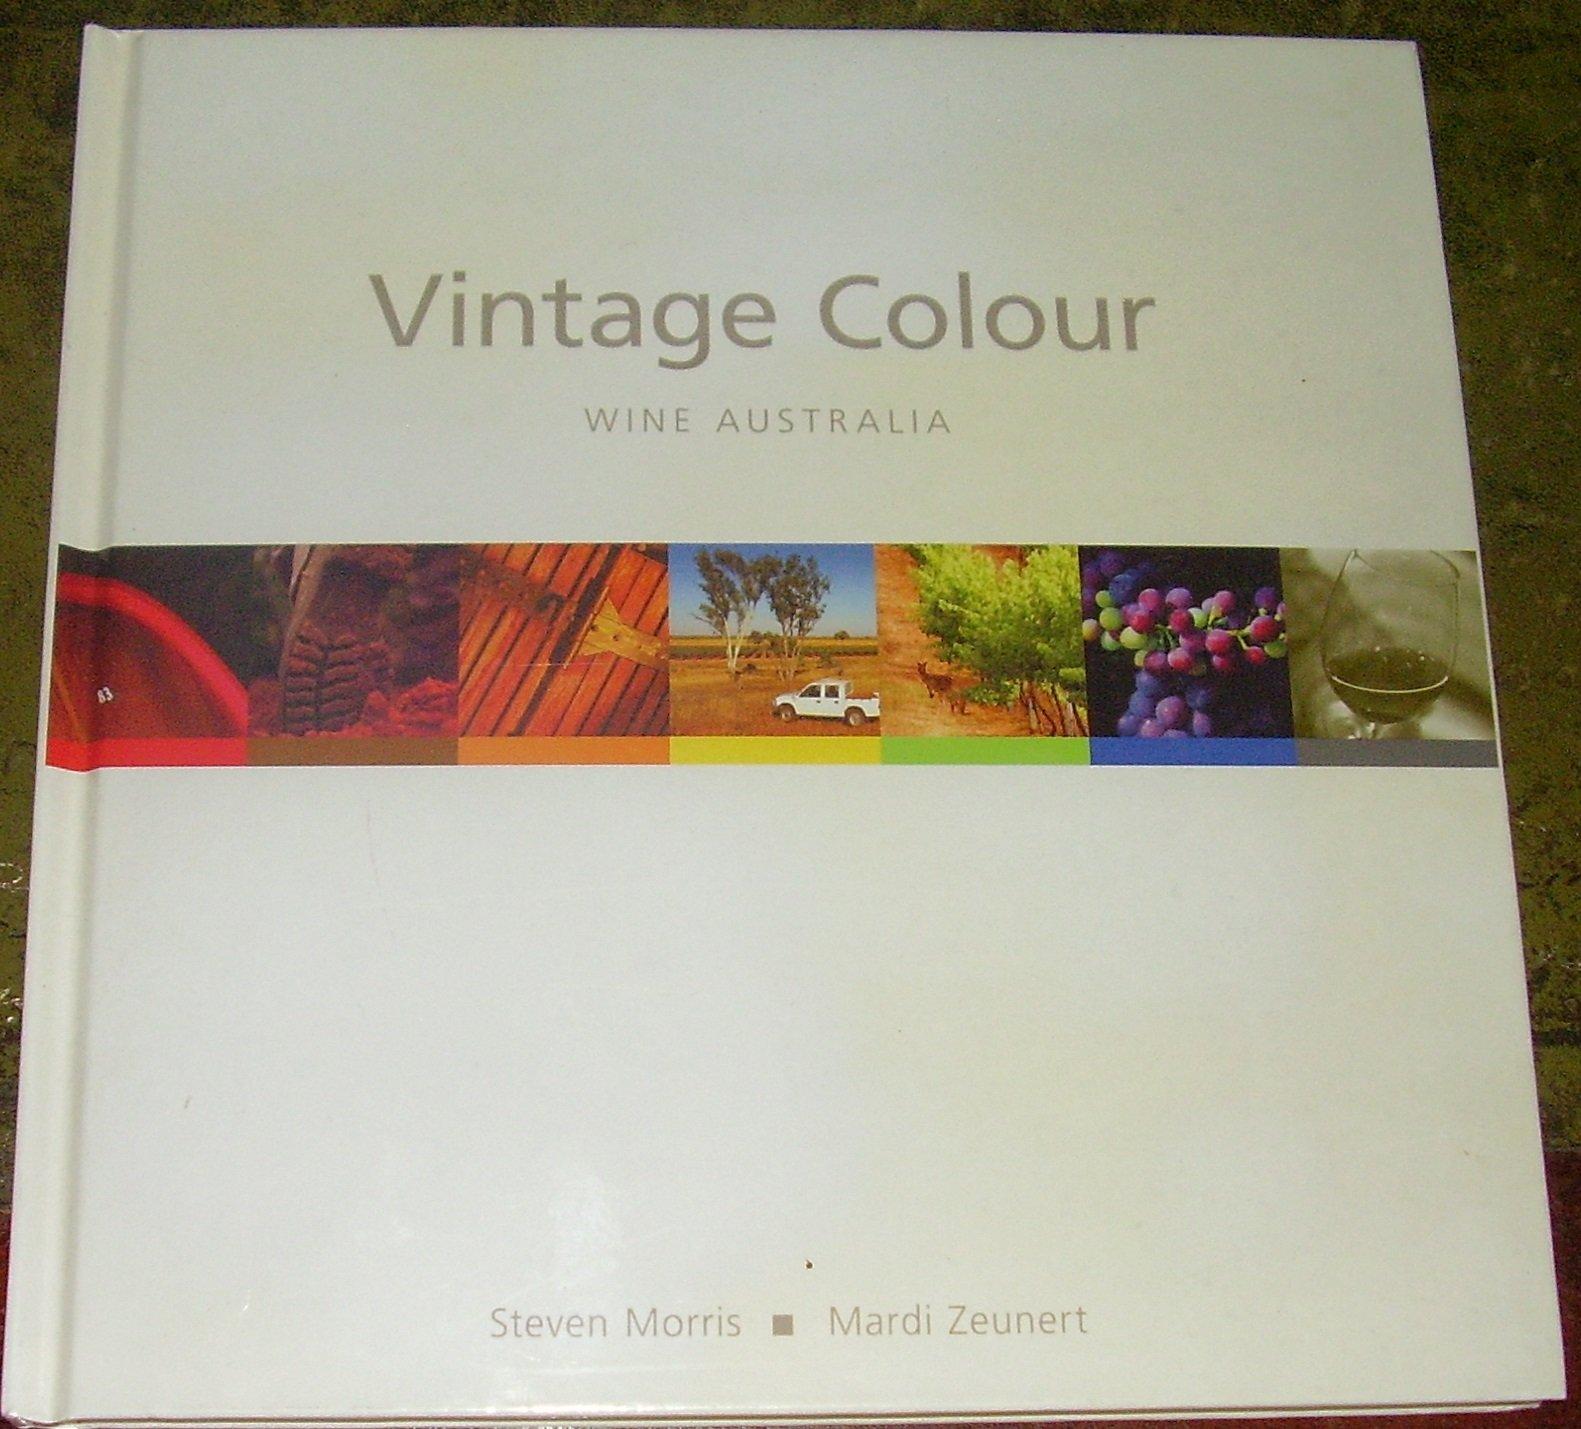 VINTAGE COLOUR  WINE AUSTRALIA ebook